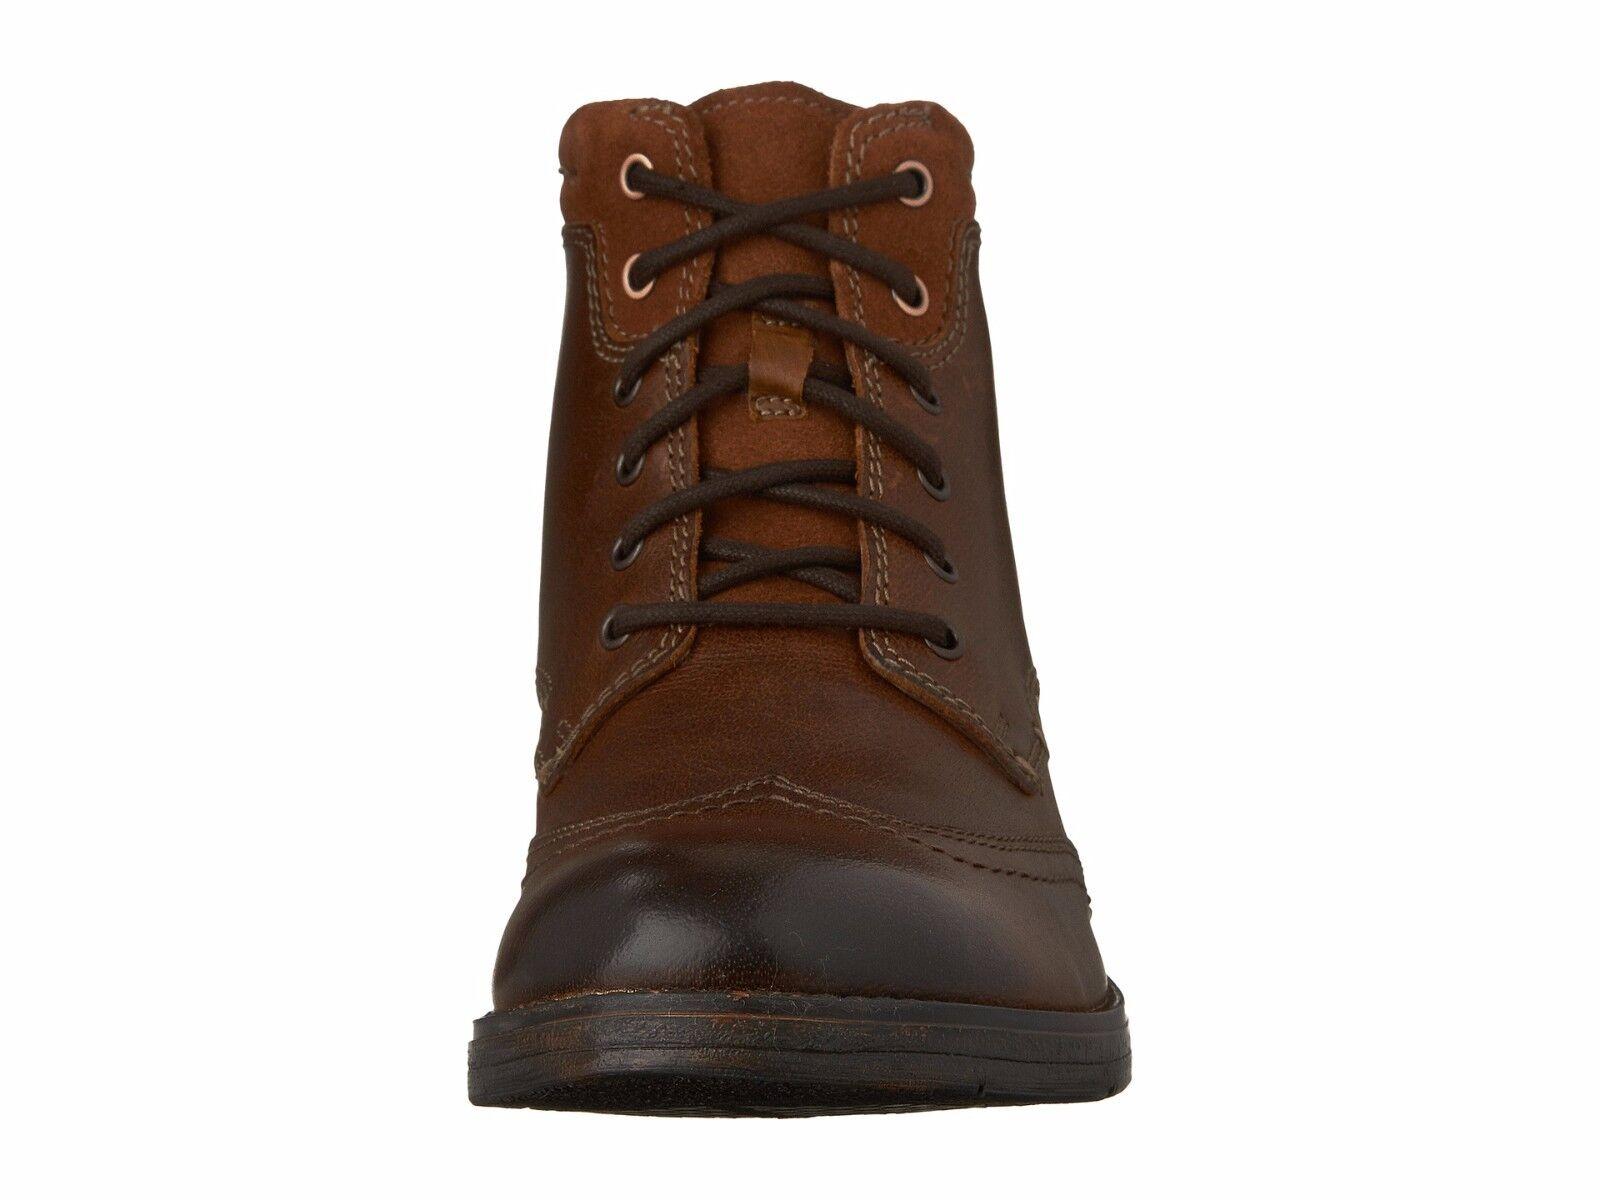 Clarks Uomo Devington Hi Wingtip Lace Up Stivali Business Casual Ankle Stivali Up Dress Shoes f7d3d6